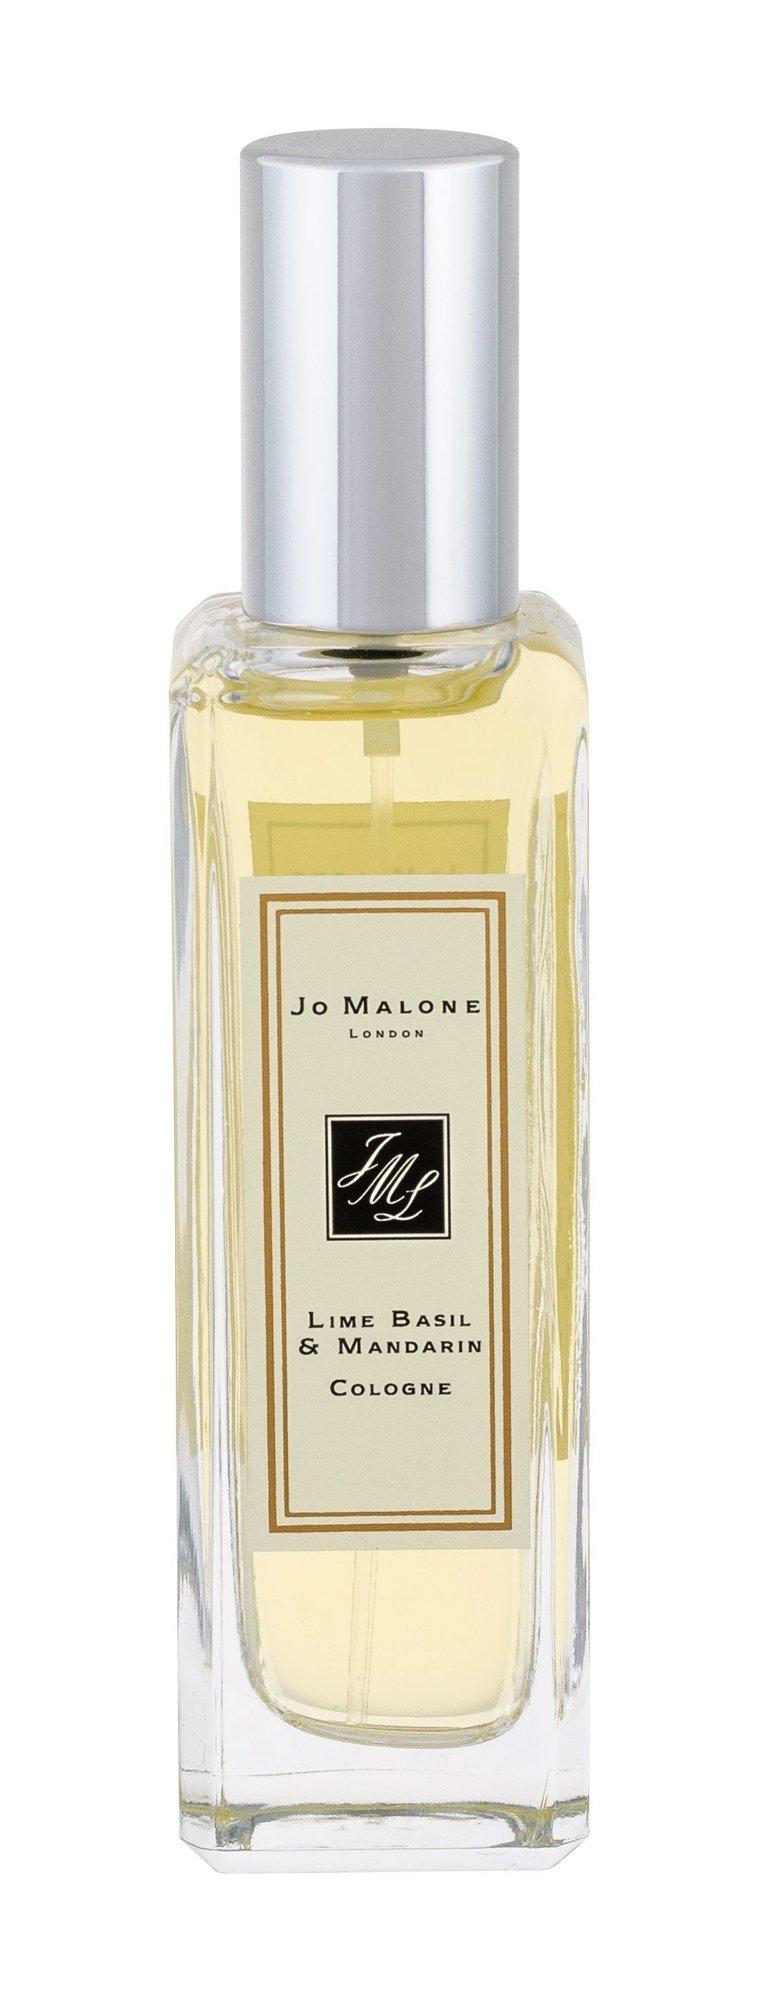 Jo Malone Lime Basil & Mandarin Eau de Cologne 30ml